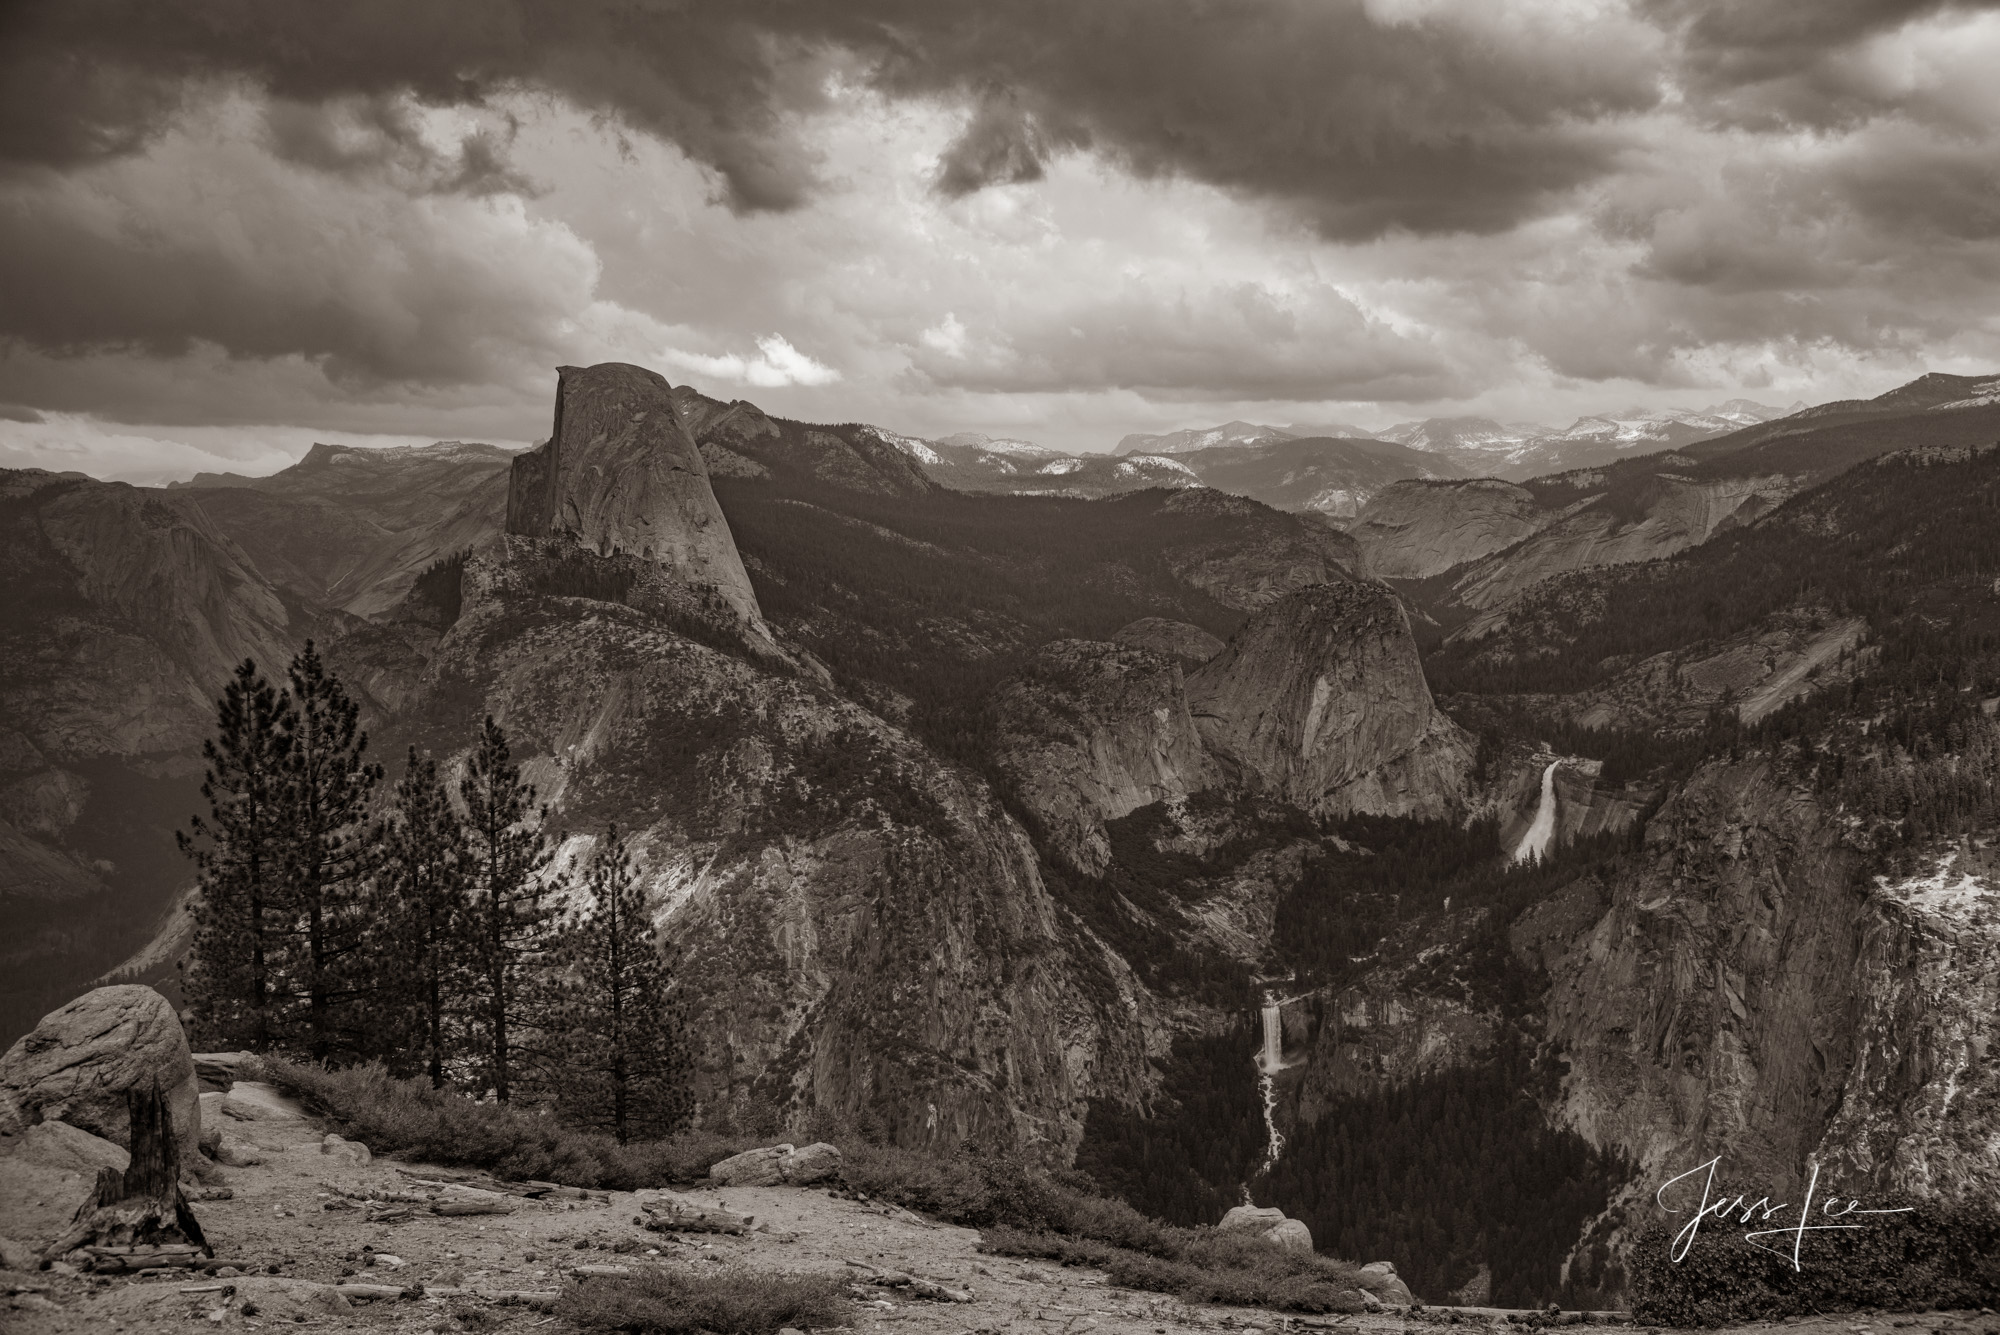 Fine Art Limited Edition Black and White Photographic Print of Yosemite.  California Landscape black and white print of Yosemite...